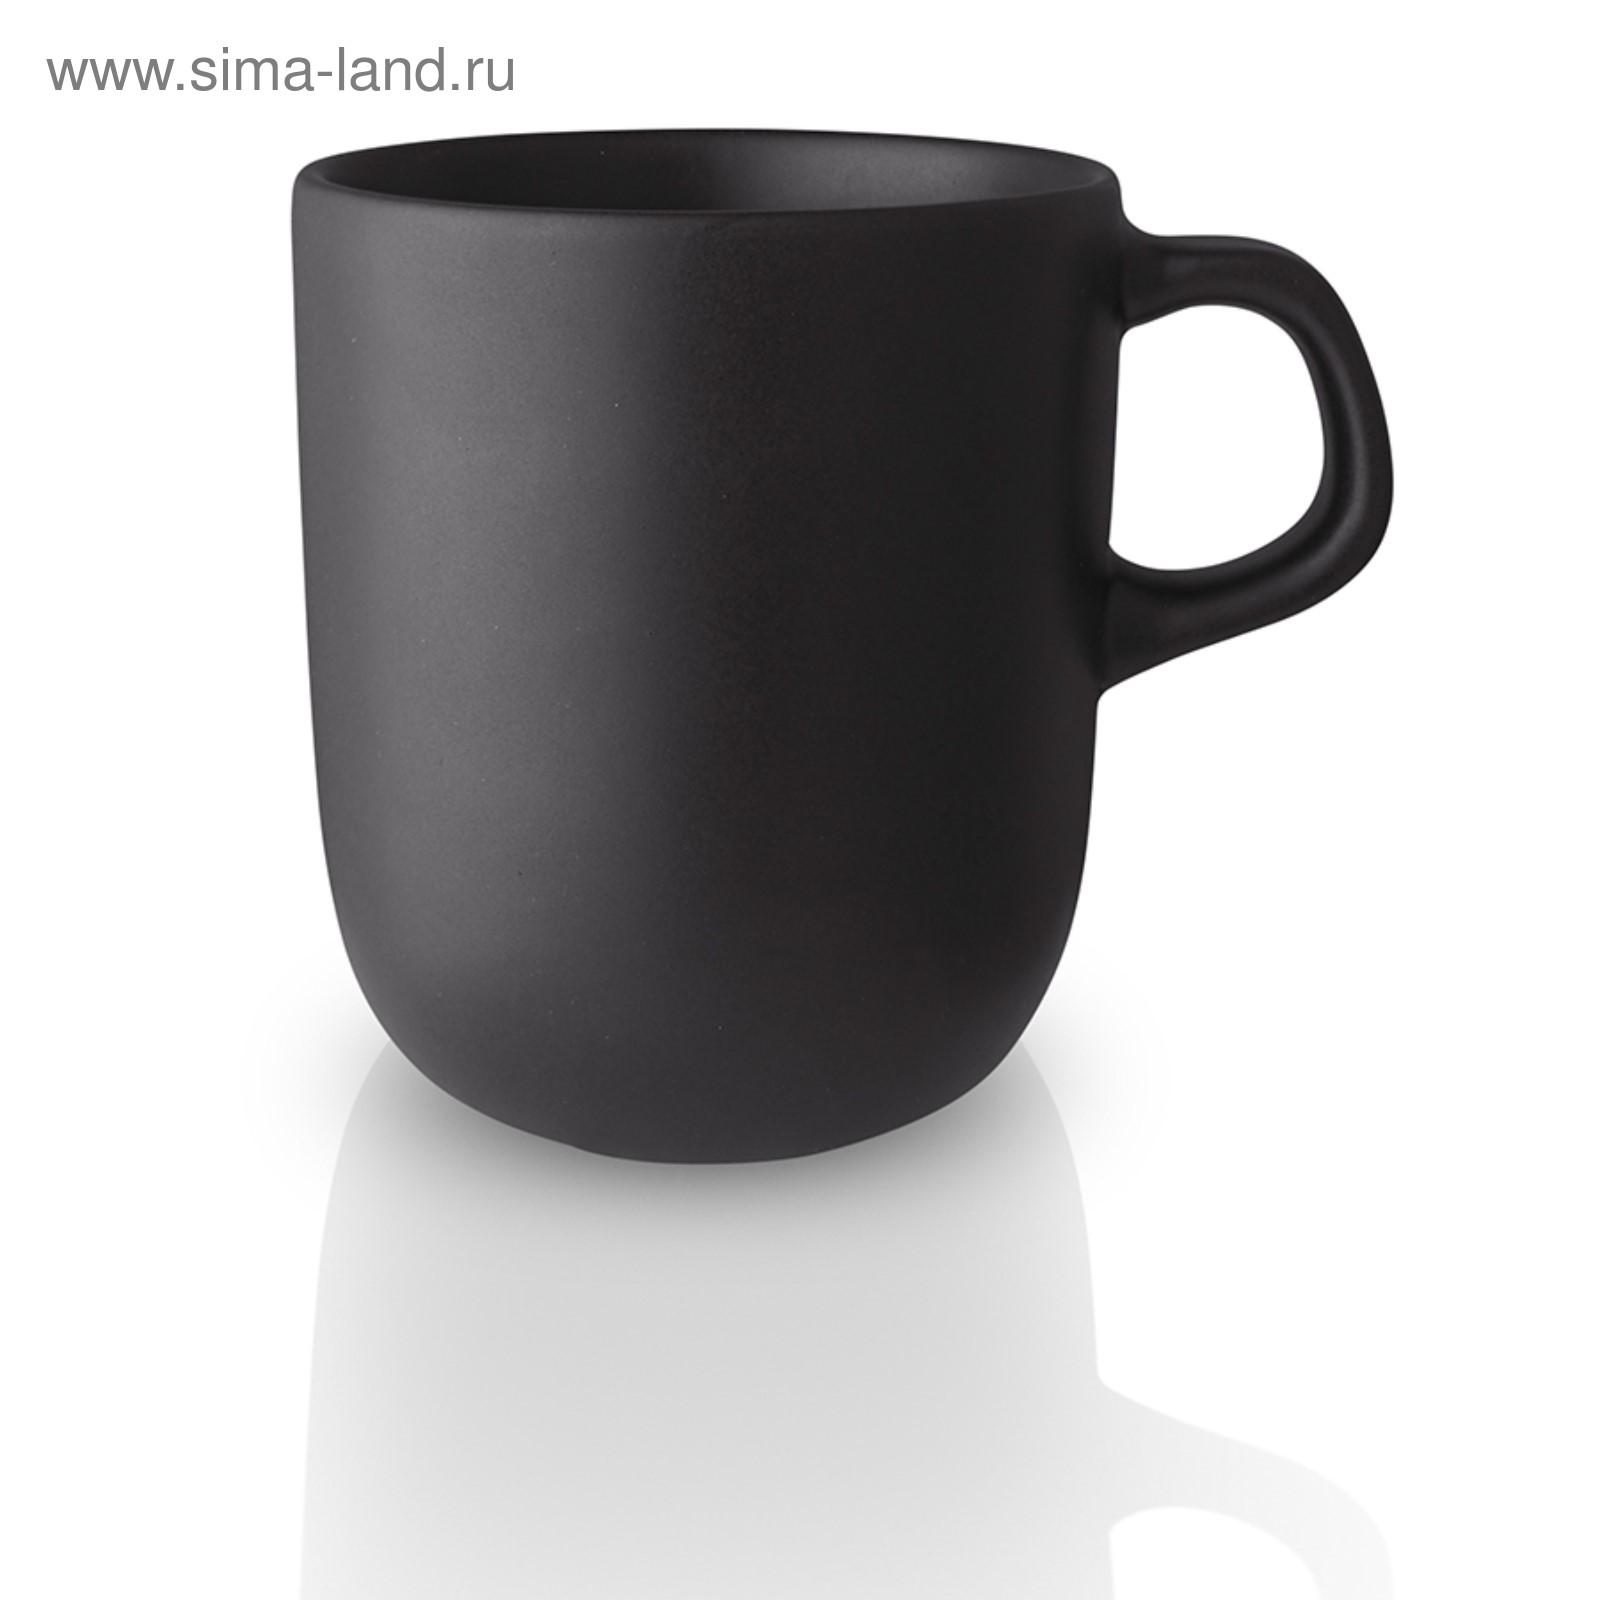 377fb0528c1f3 Чашка nordic kitchen 300 мл (3091626) - Купить по цене от 1026.00 ...